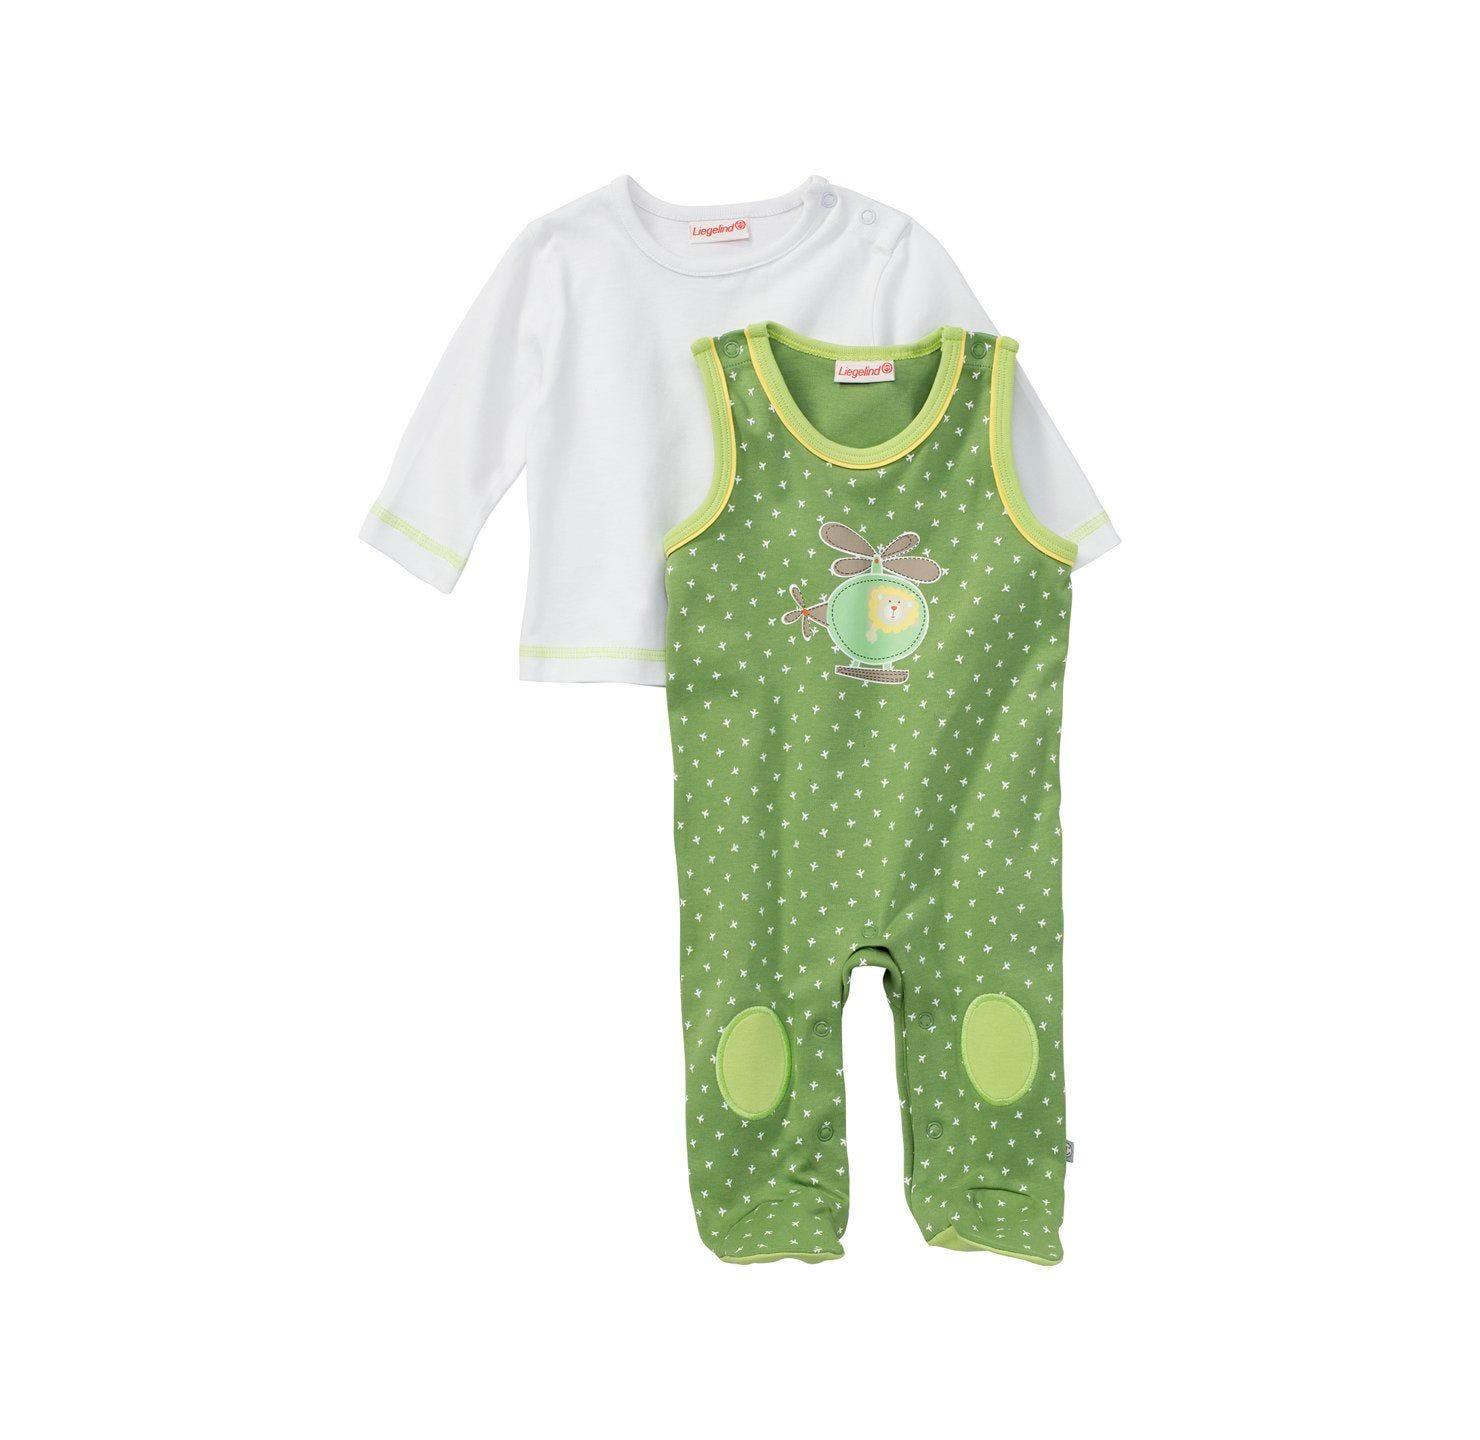 Body Kurzarmbody 50 56 62 68 74 80 86 92 NEU Baby Body UNISEX Reborn Neugeborene